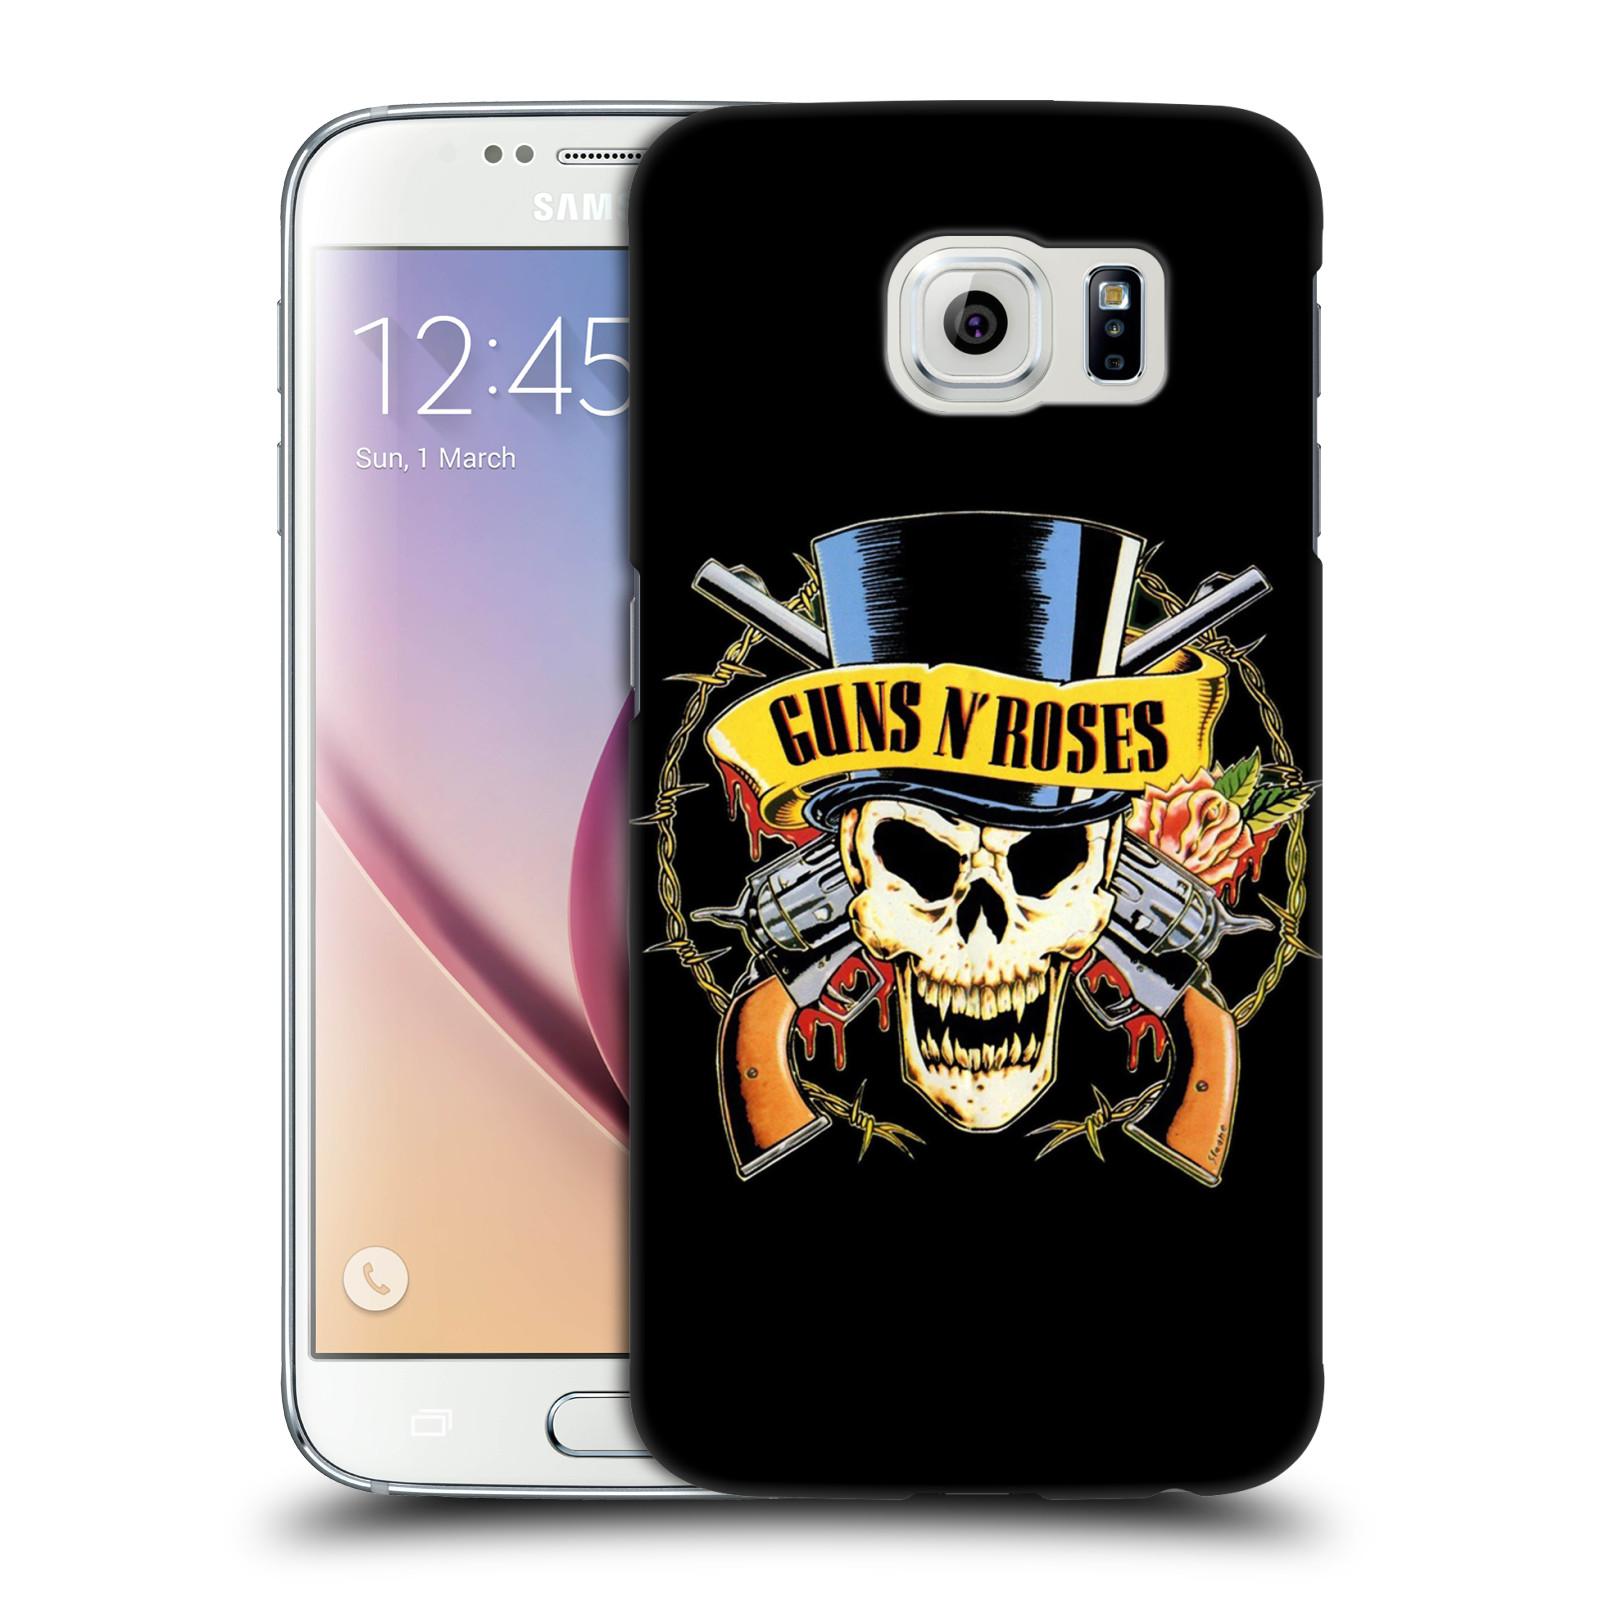 Plastové pouzdro na mobil Samsung Galaxy S6 HEAD CASE Guns N' Roses - Lebka